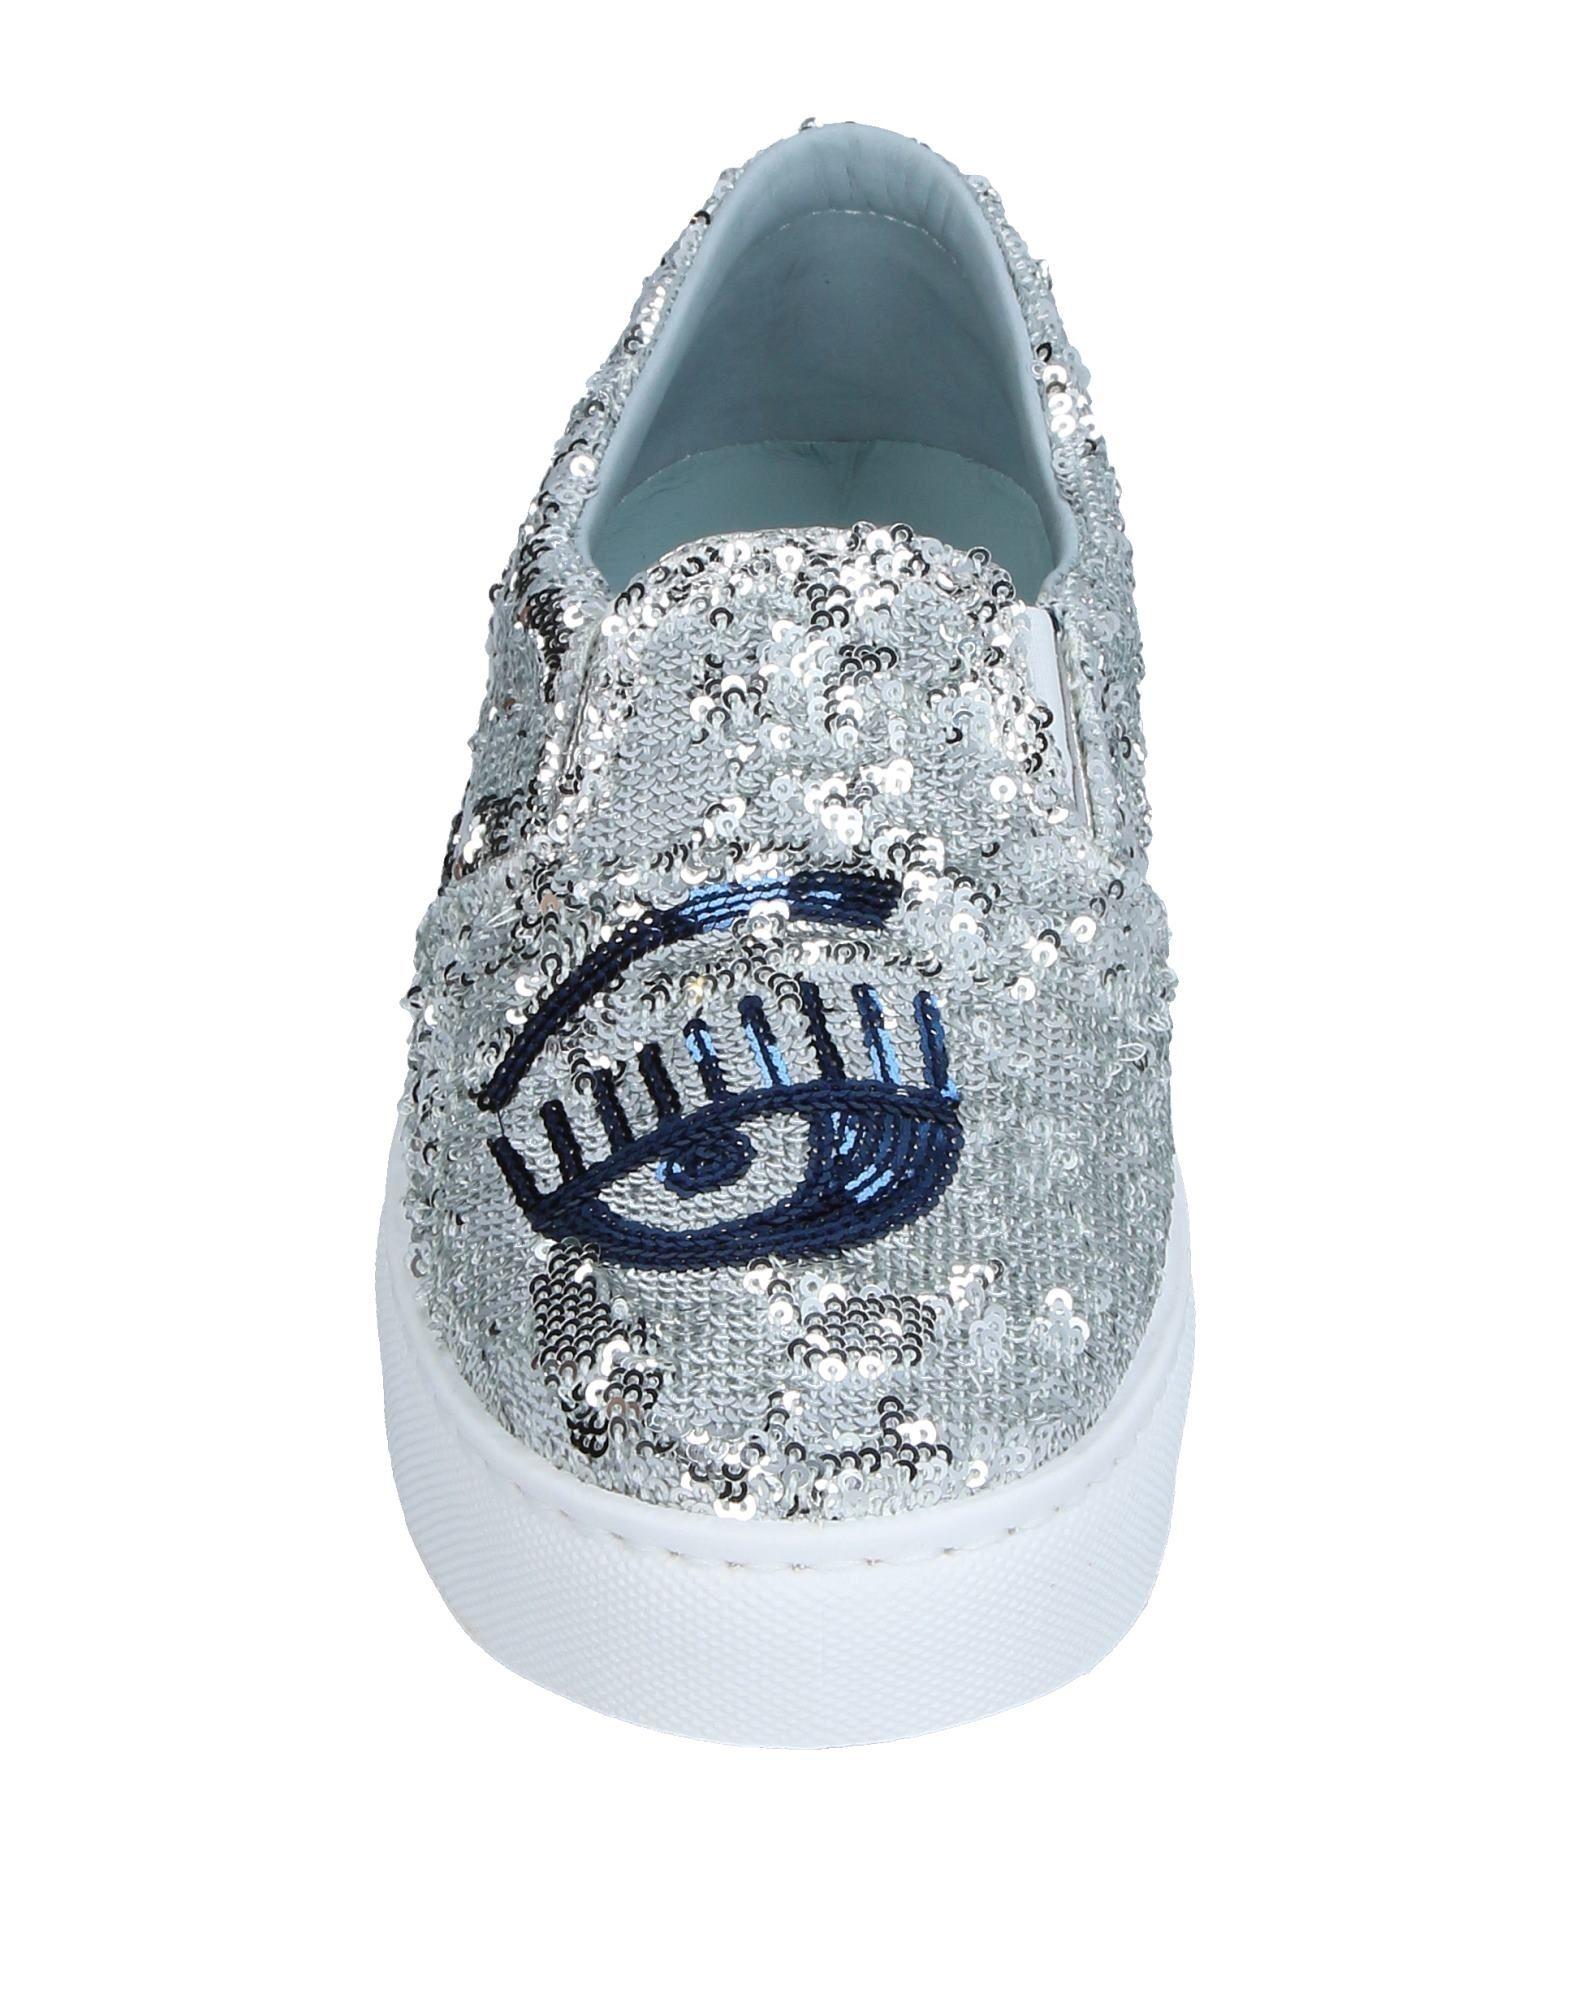 Stilvolle billige Sneakers Schuhe Chiara Ferragni Sneakers billige Damen  11227858NO 4c6e69